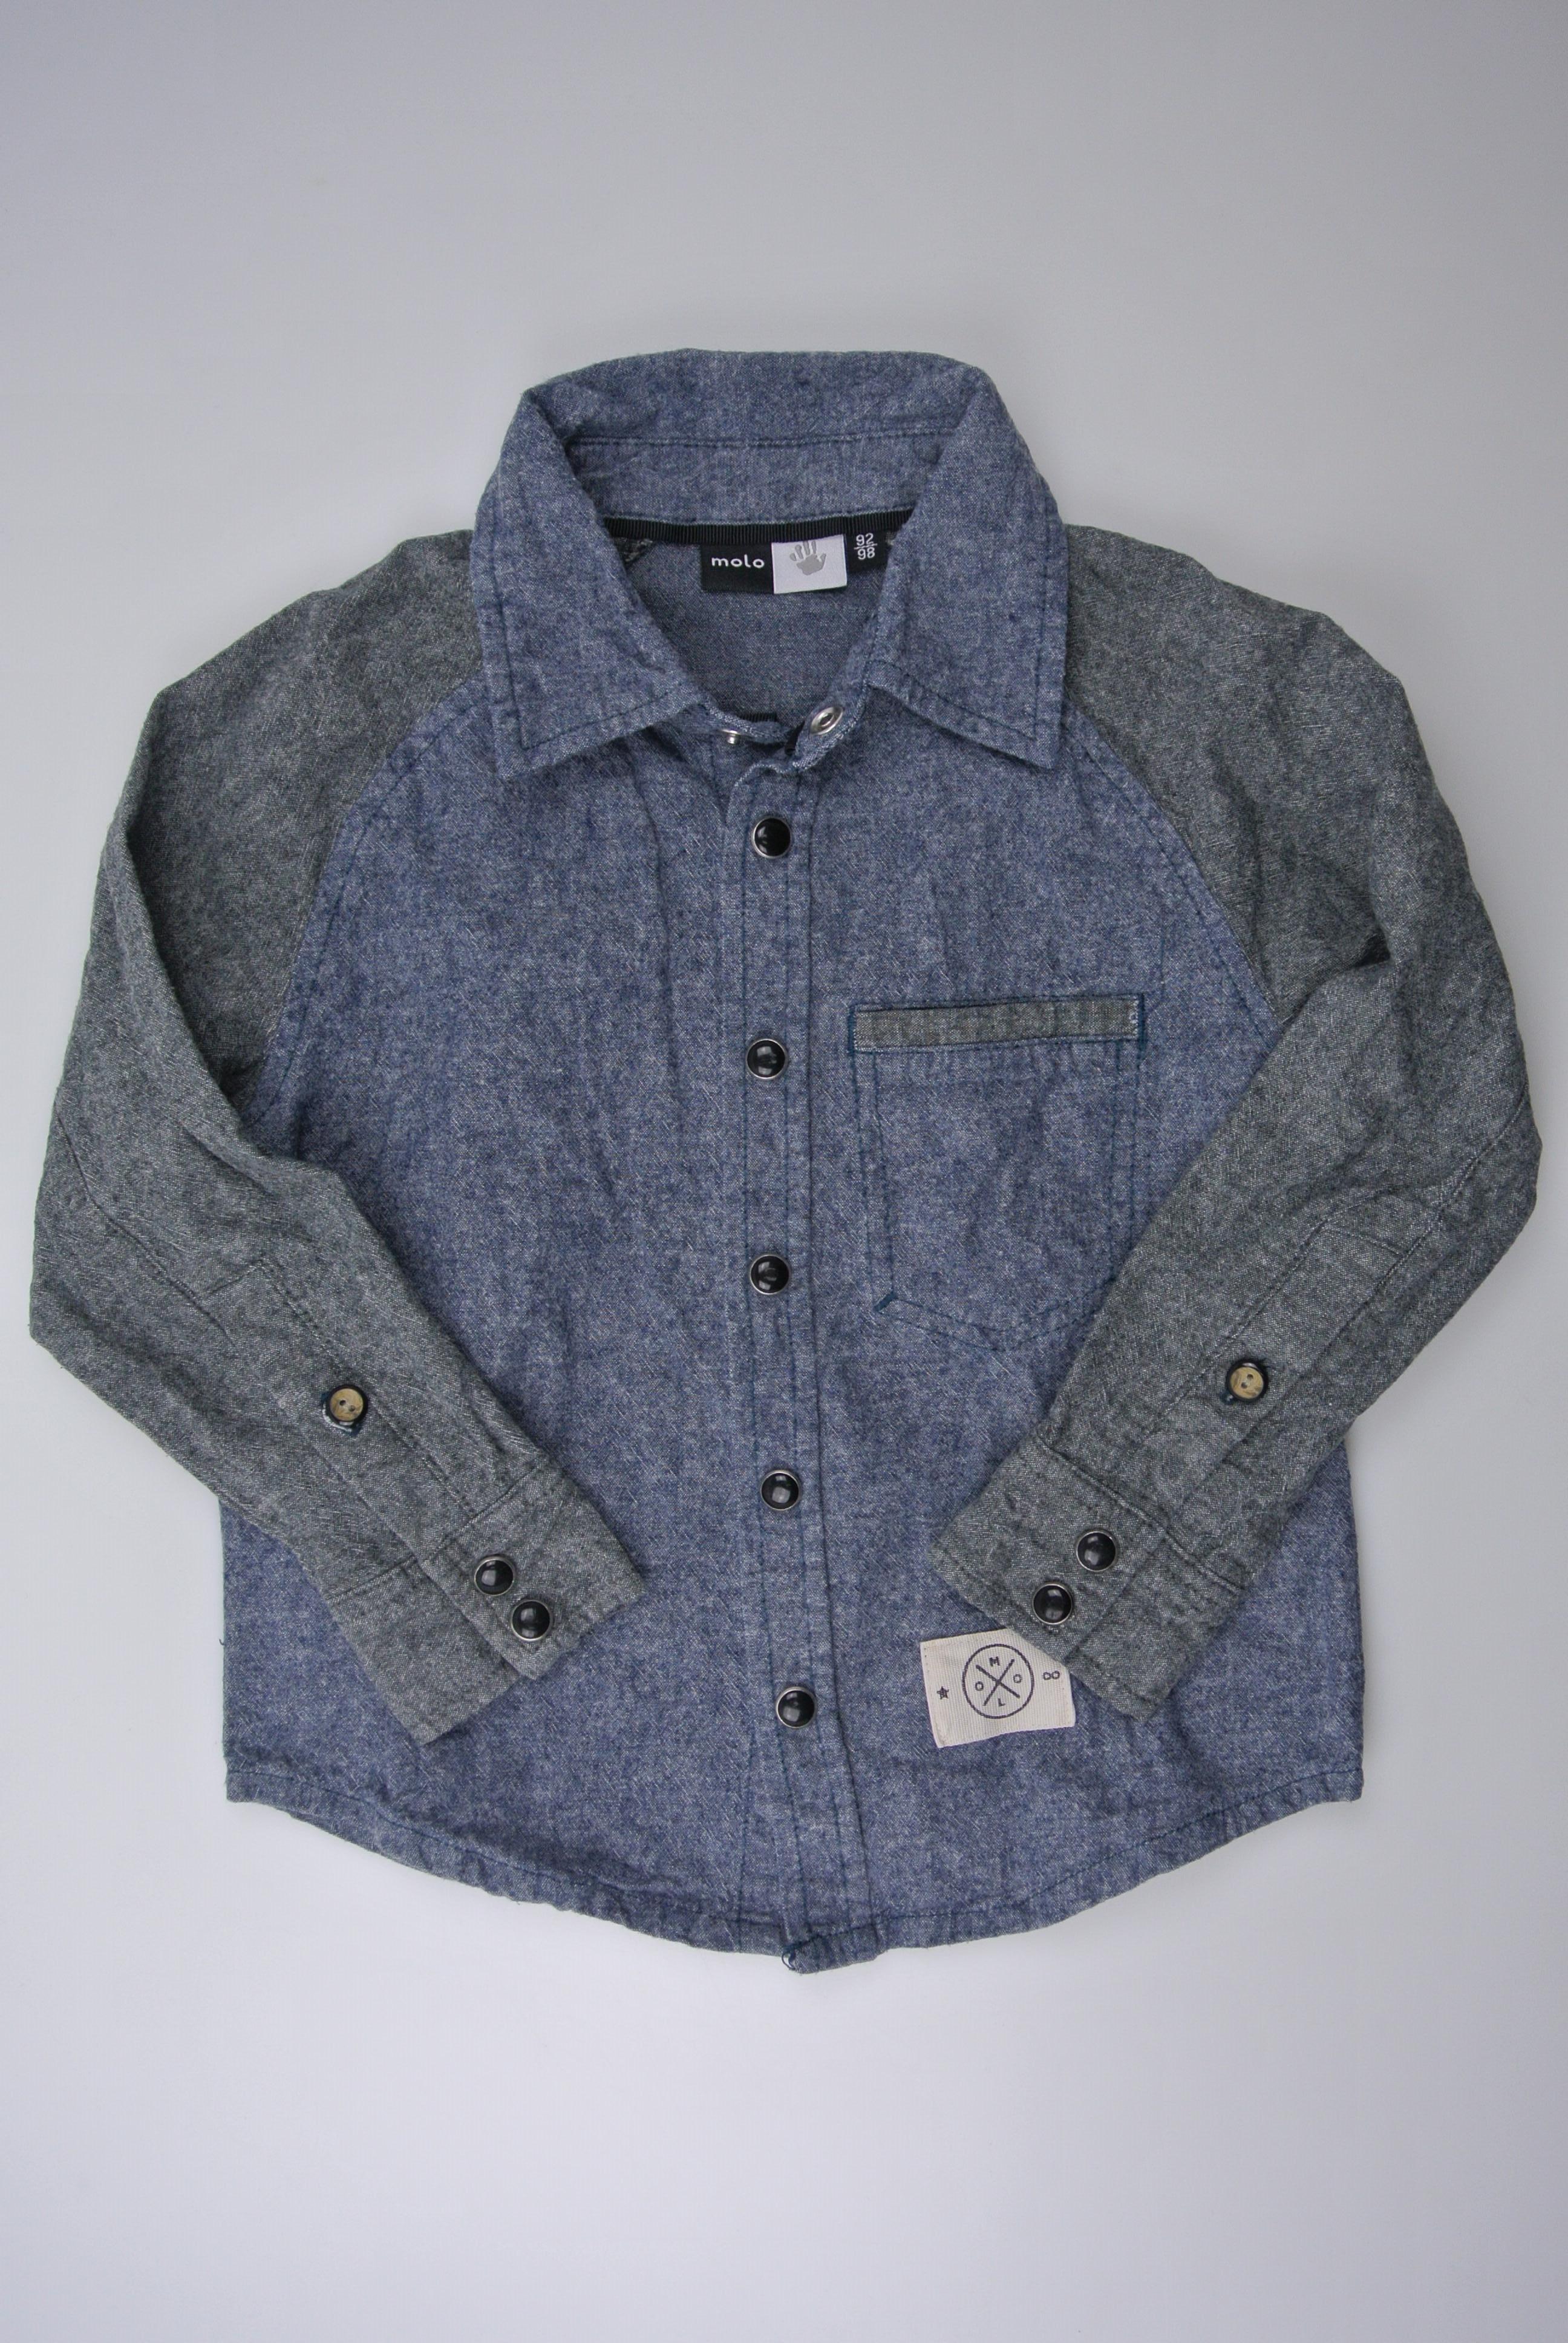 Molo skjorte str 92/98 dreng